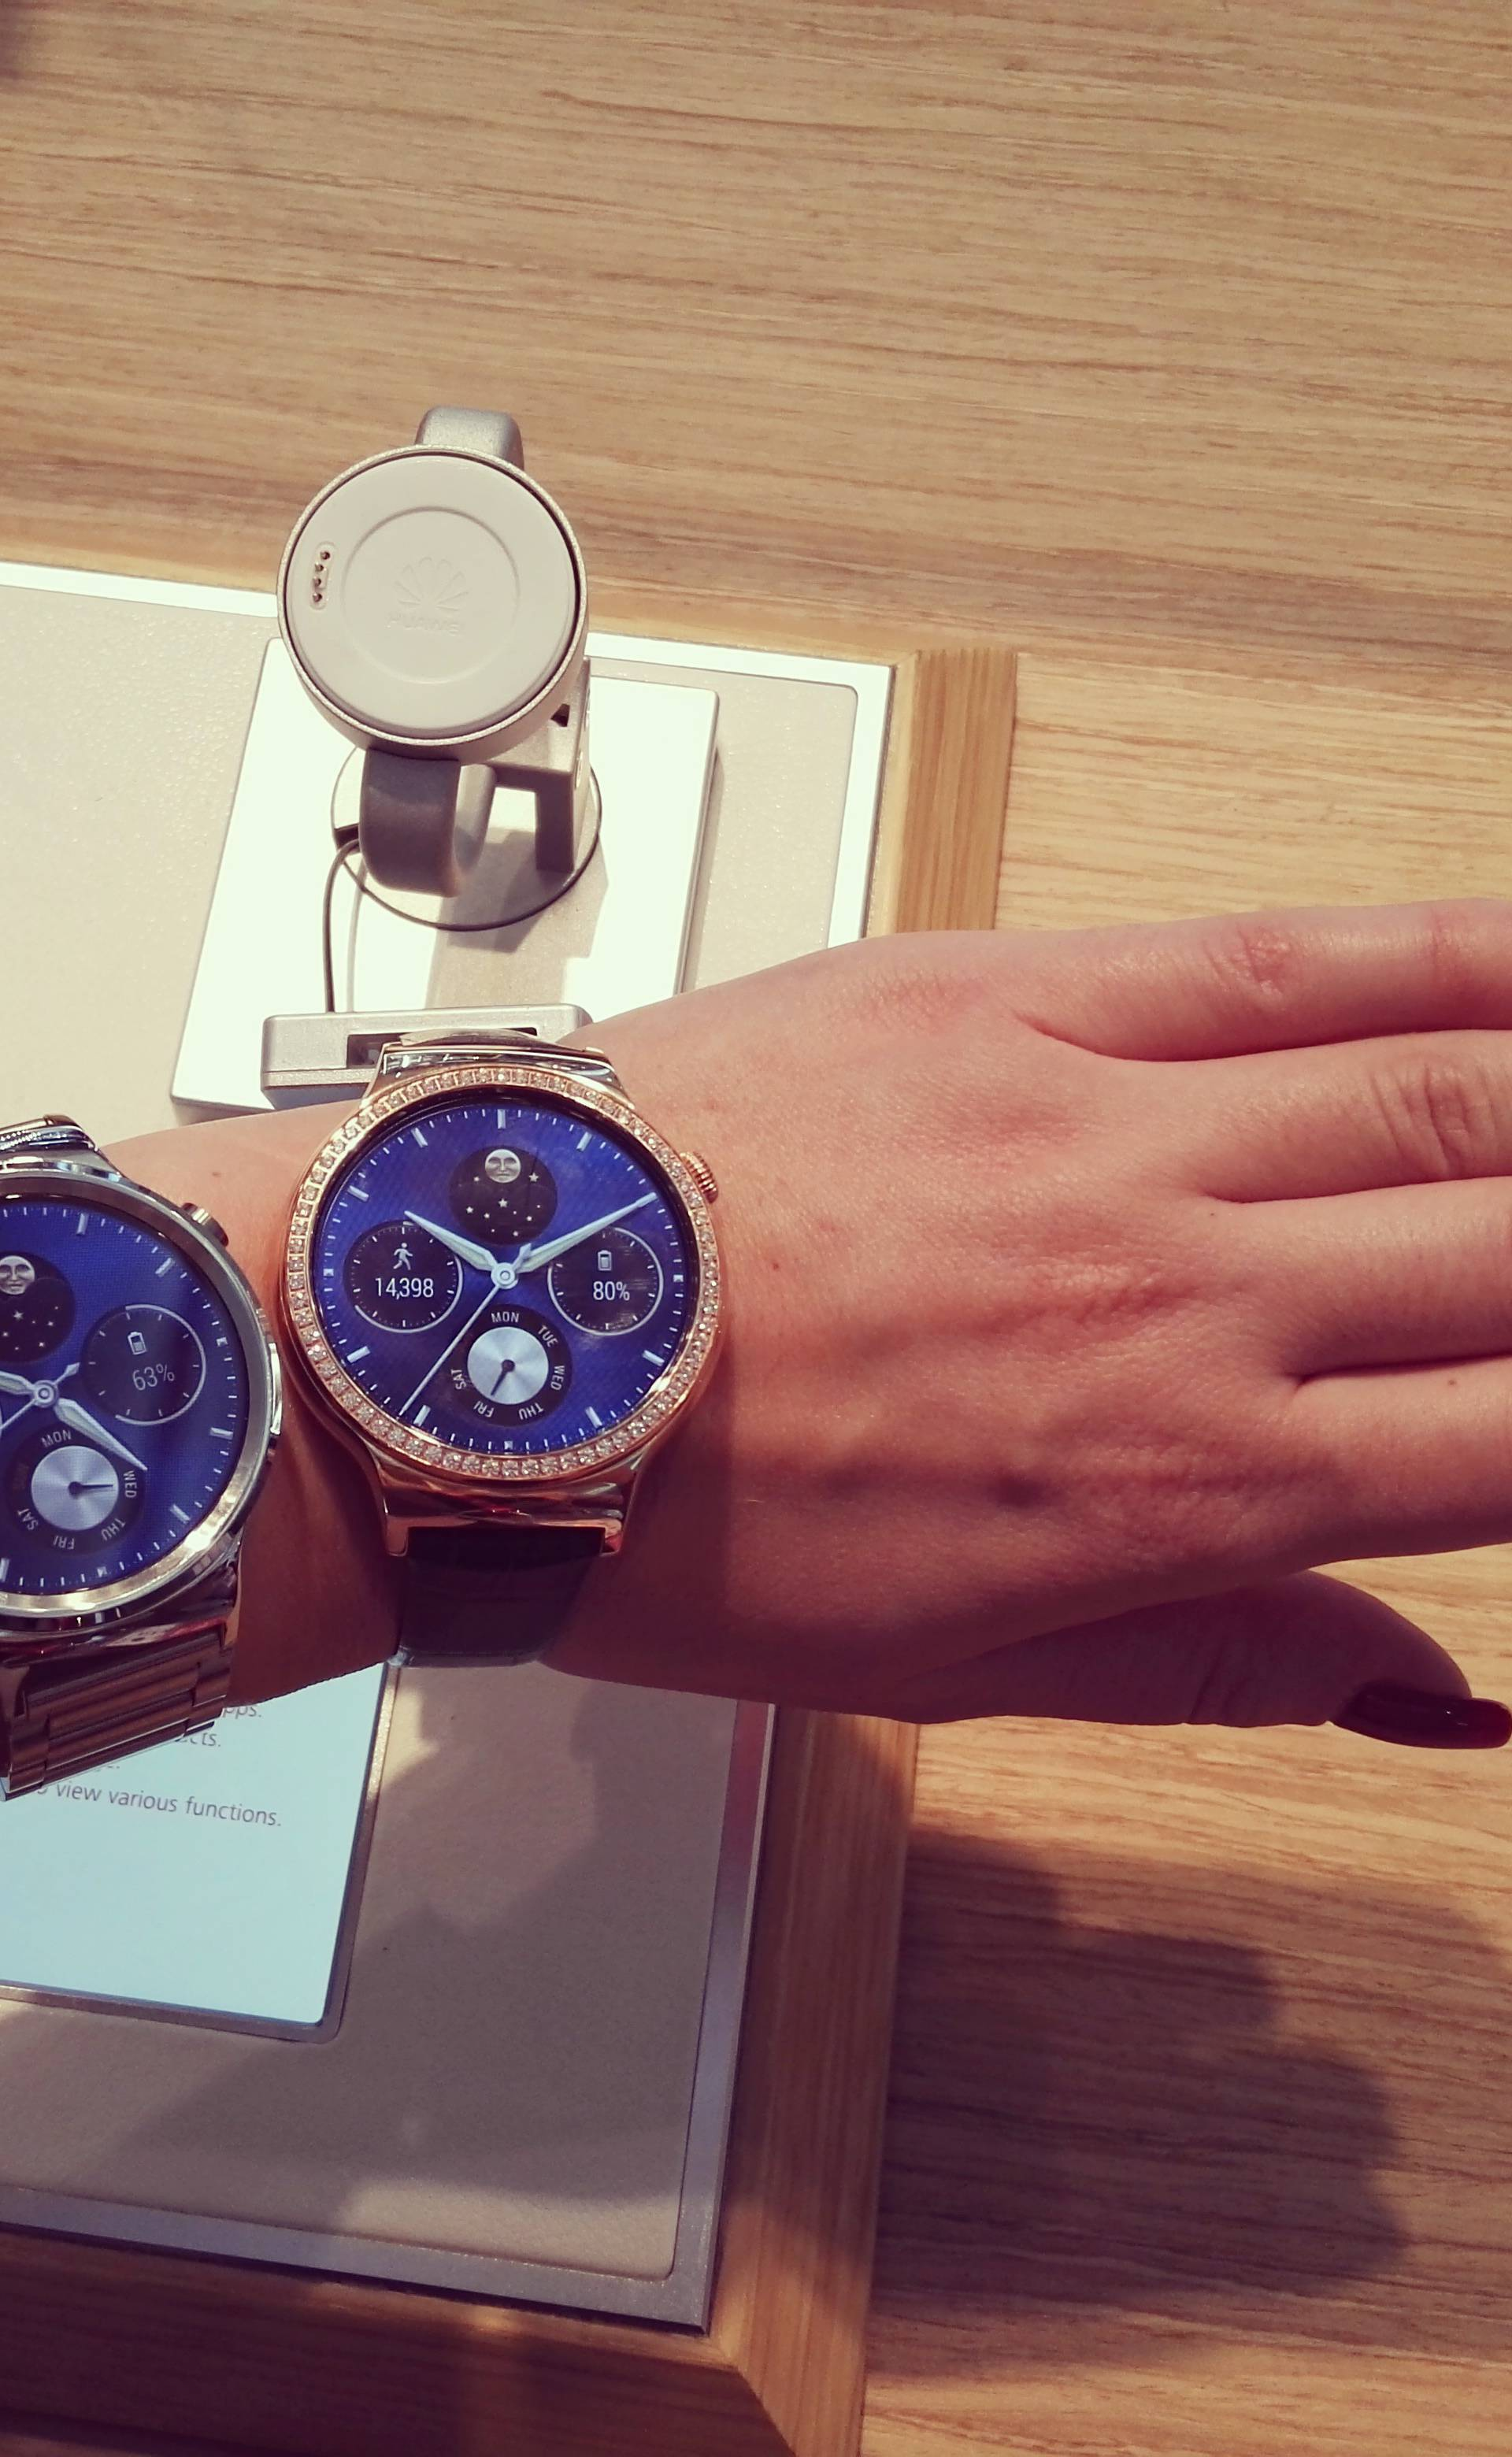 Jedan od najboljih: Huaweijev sat krasi vrlo impresivni ekran